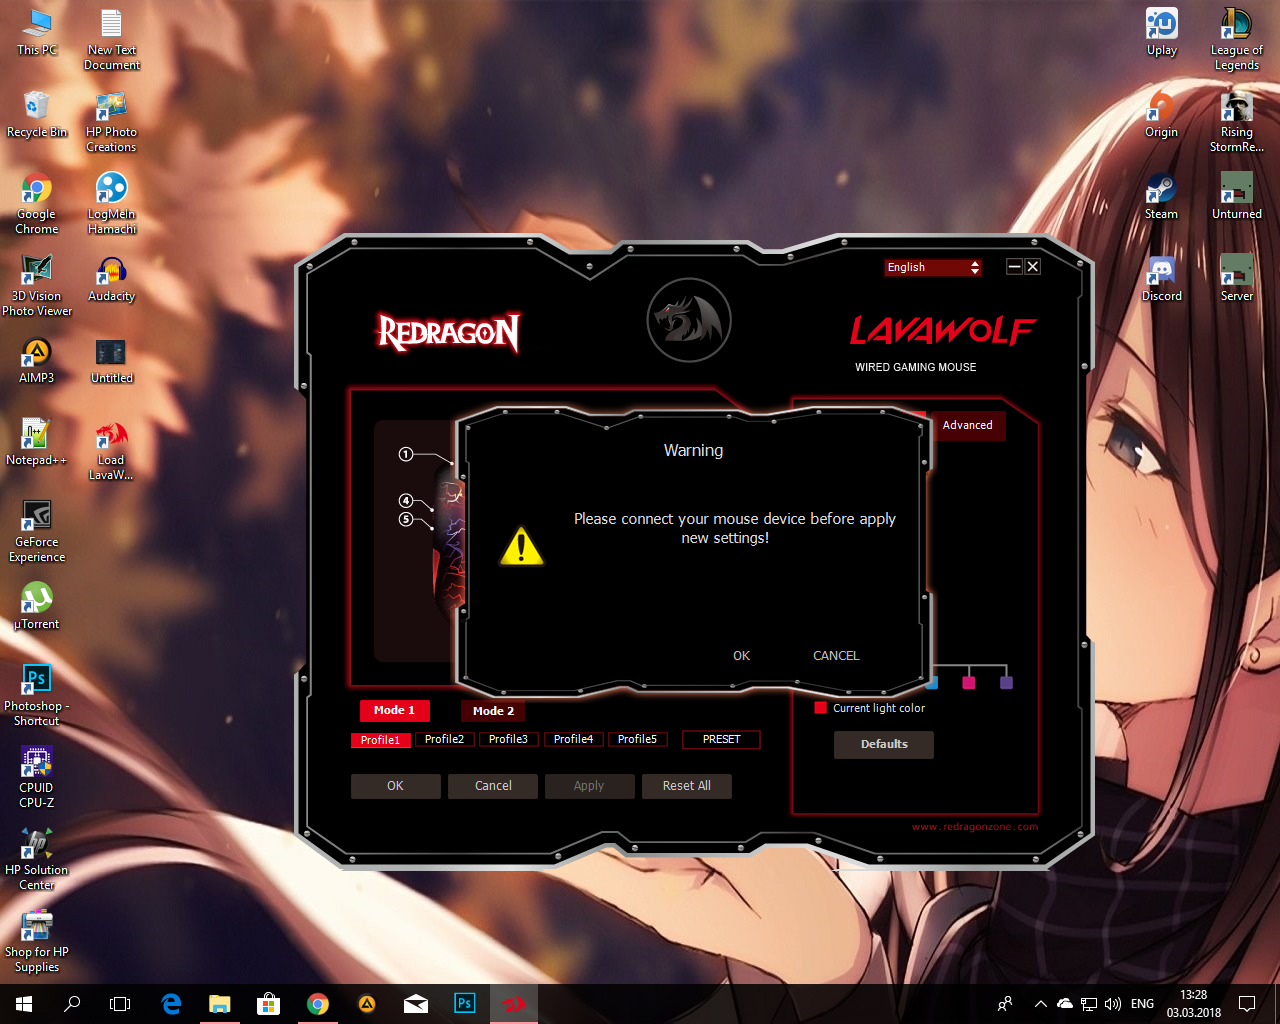 Driver For My Redragon Lavawolf Microsoft Community